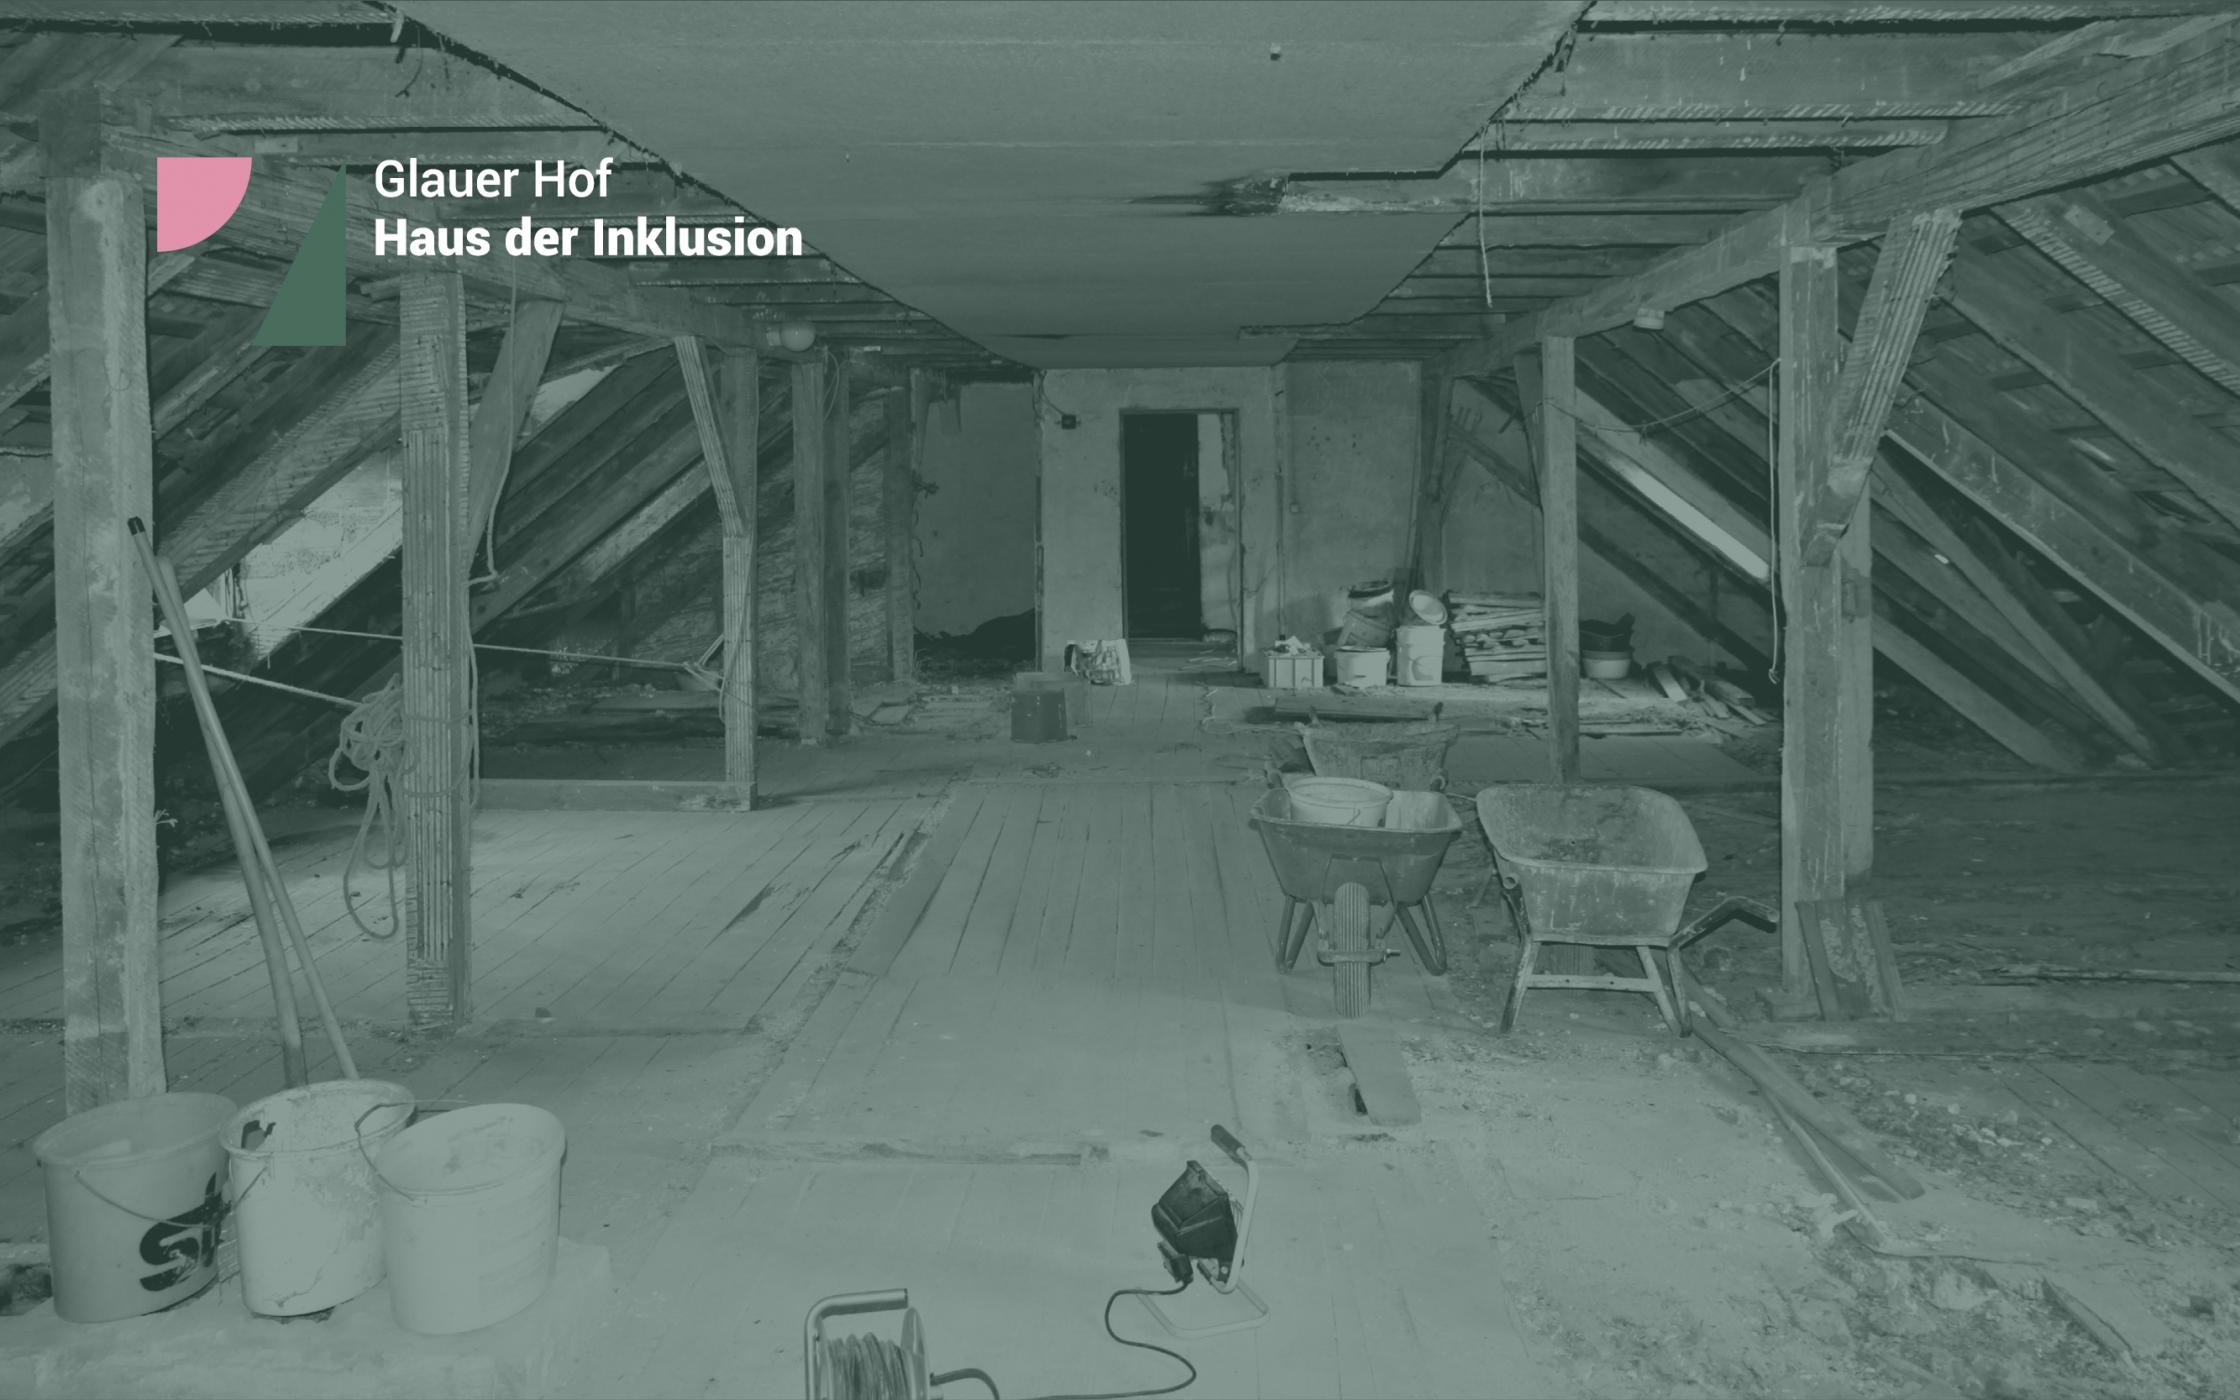 Dachstuhl Glauer Hof